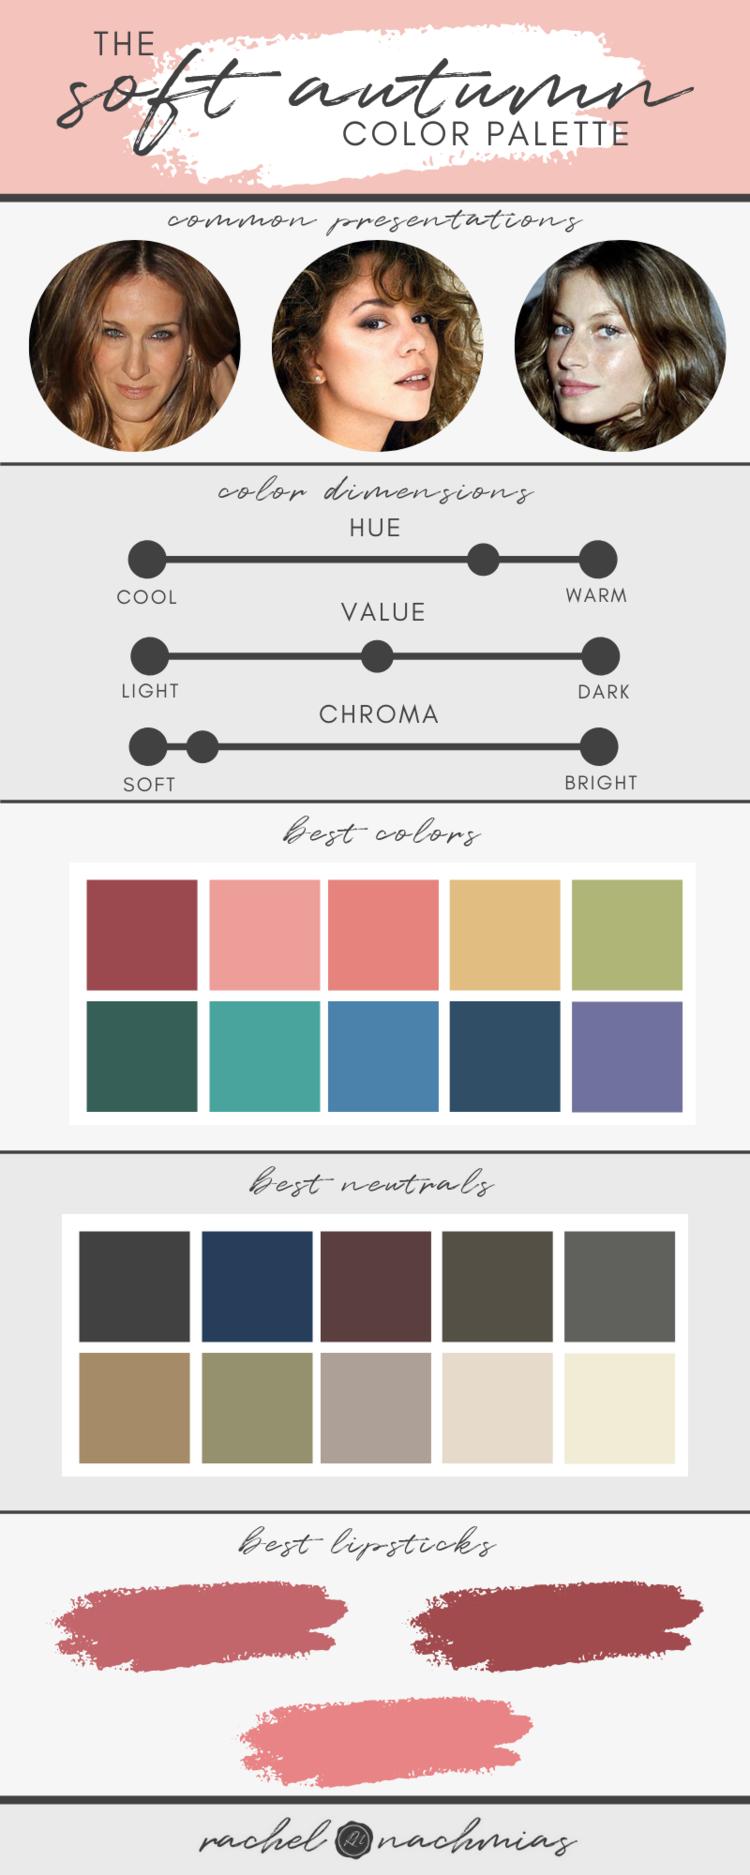 A quick overview of the Soft Autumn color palette, including Soft Autumn celebrities, Soft